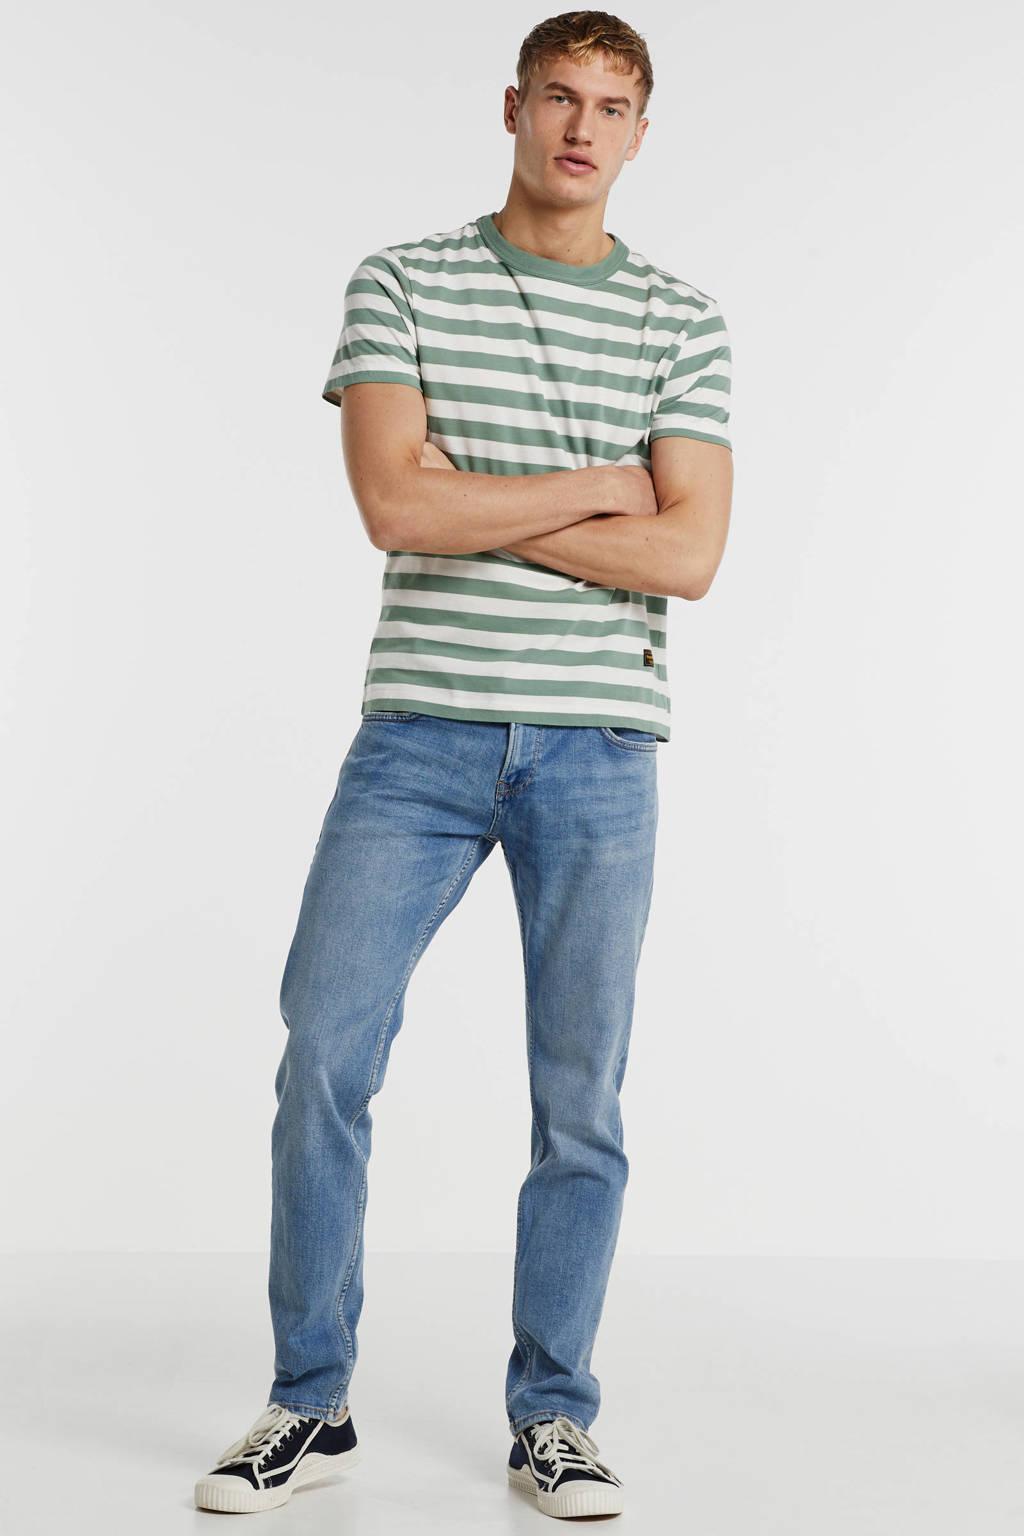 Tom Tailor slim fit jeans Piers bright blue denim, 10150 bright blue denim